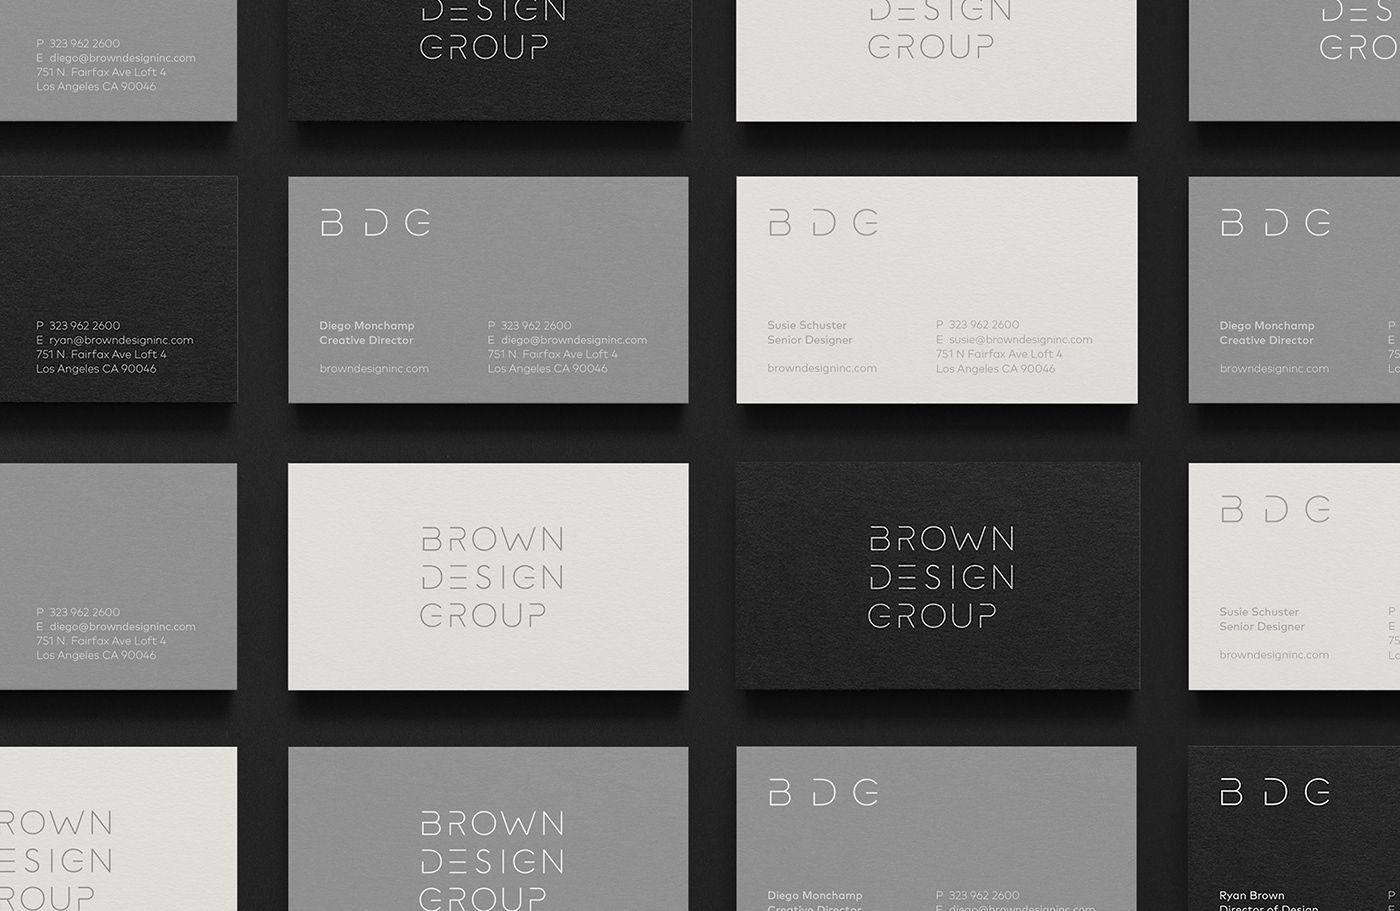 Brown Design Group On Behance Interior Design And Build Design Build Firm Design